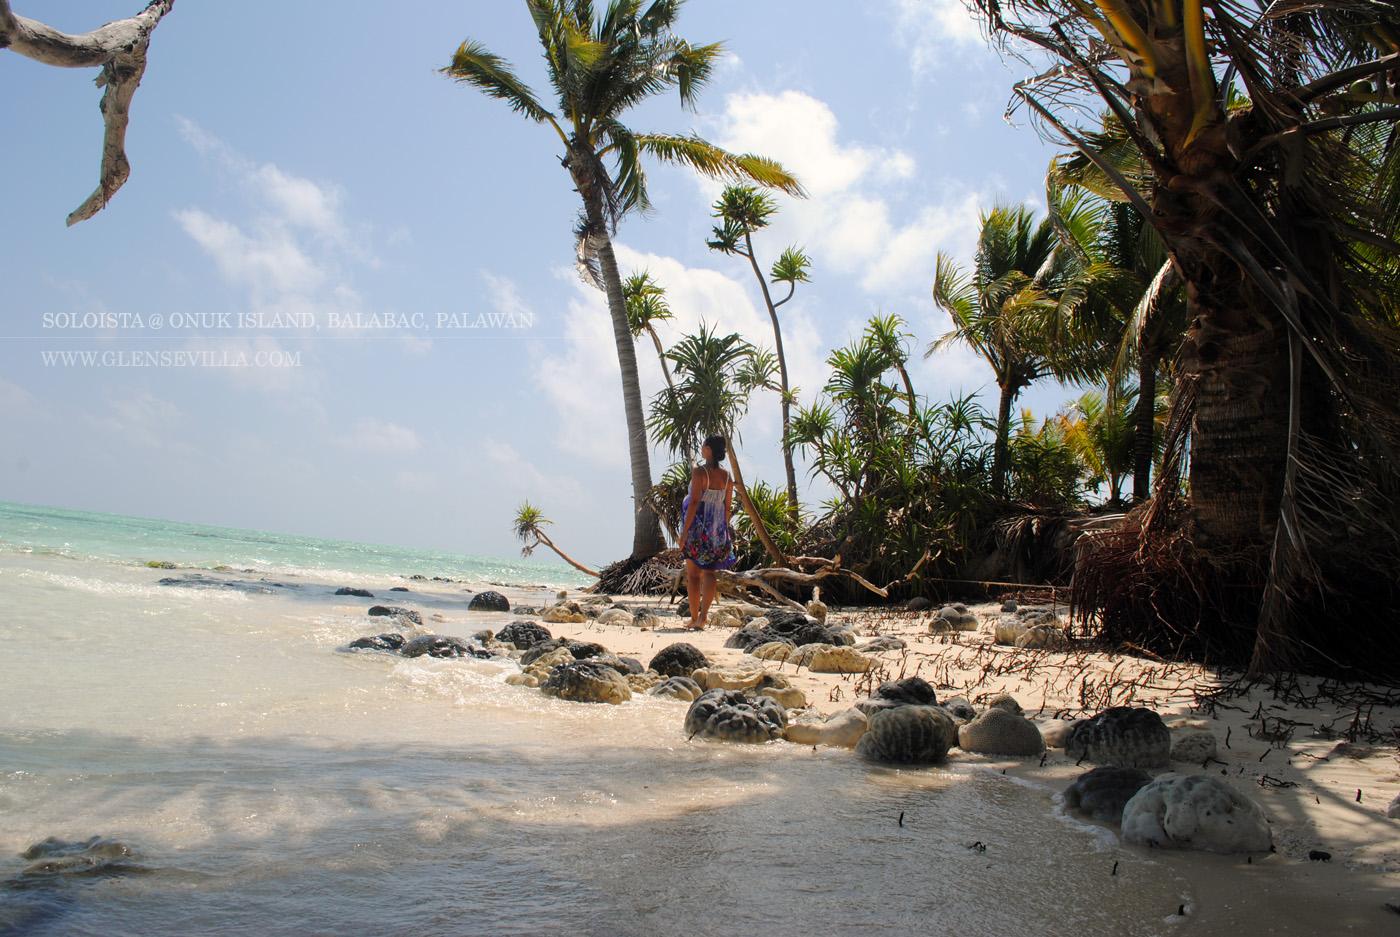 Onok Onuk Island; Balabac; Palawan; Soloista